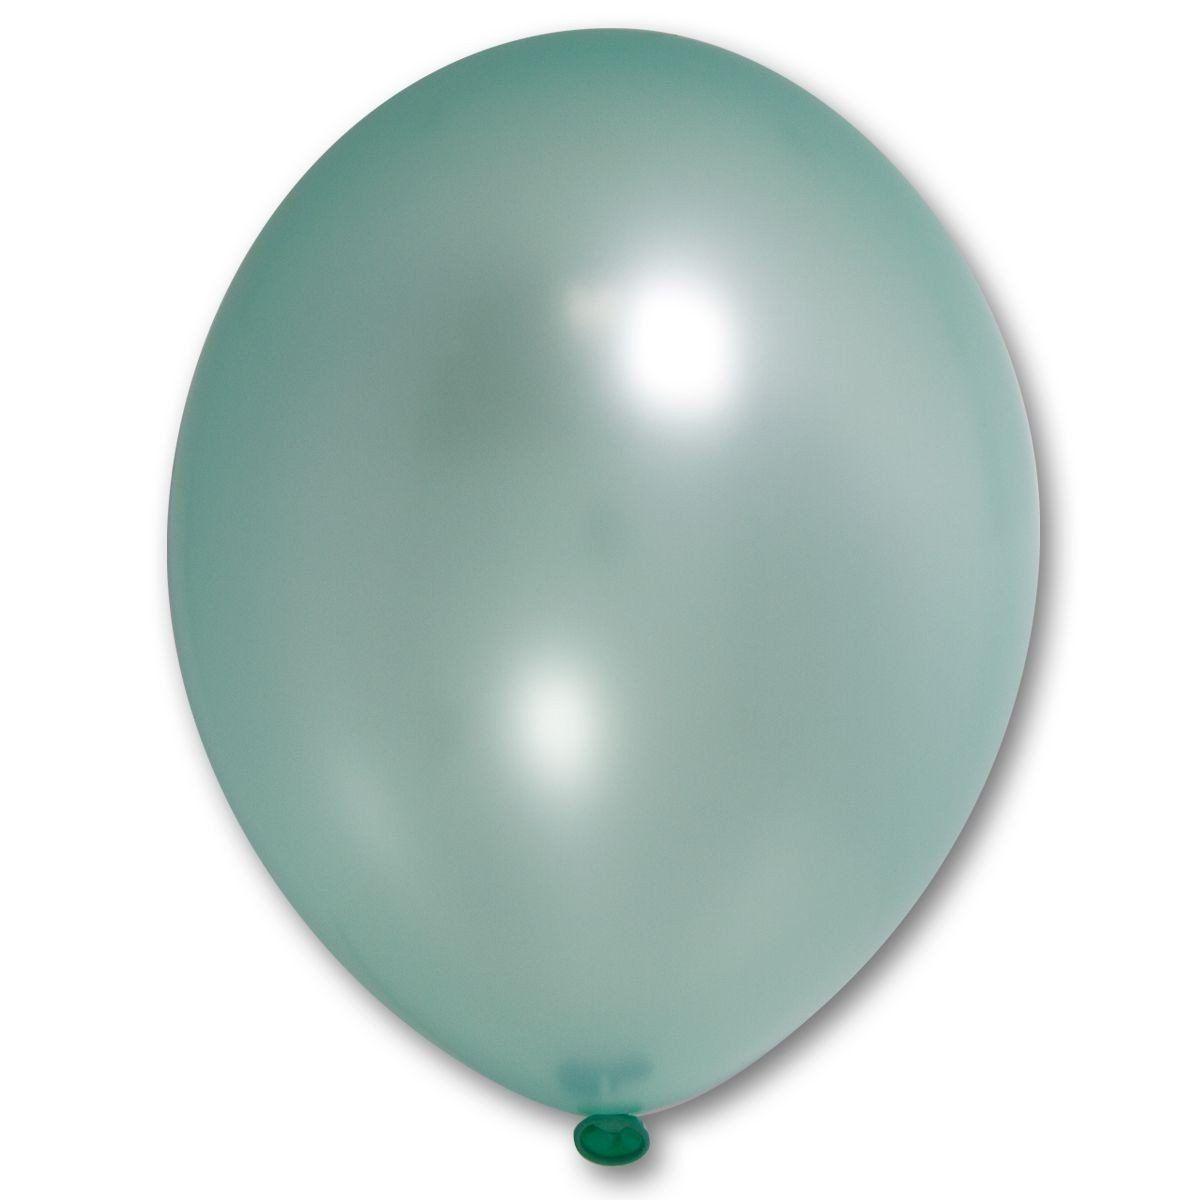 Шар BELBAL (Белбал) В 105/074 Металлик светло-зеленый